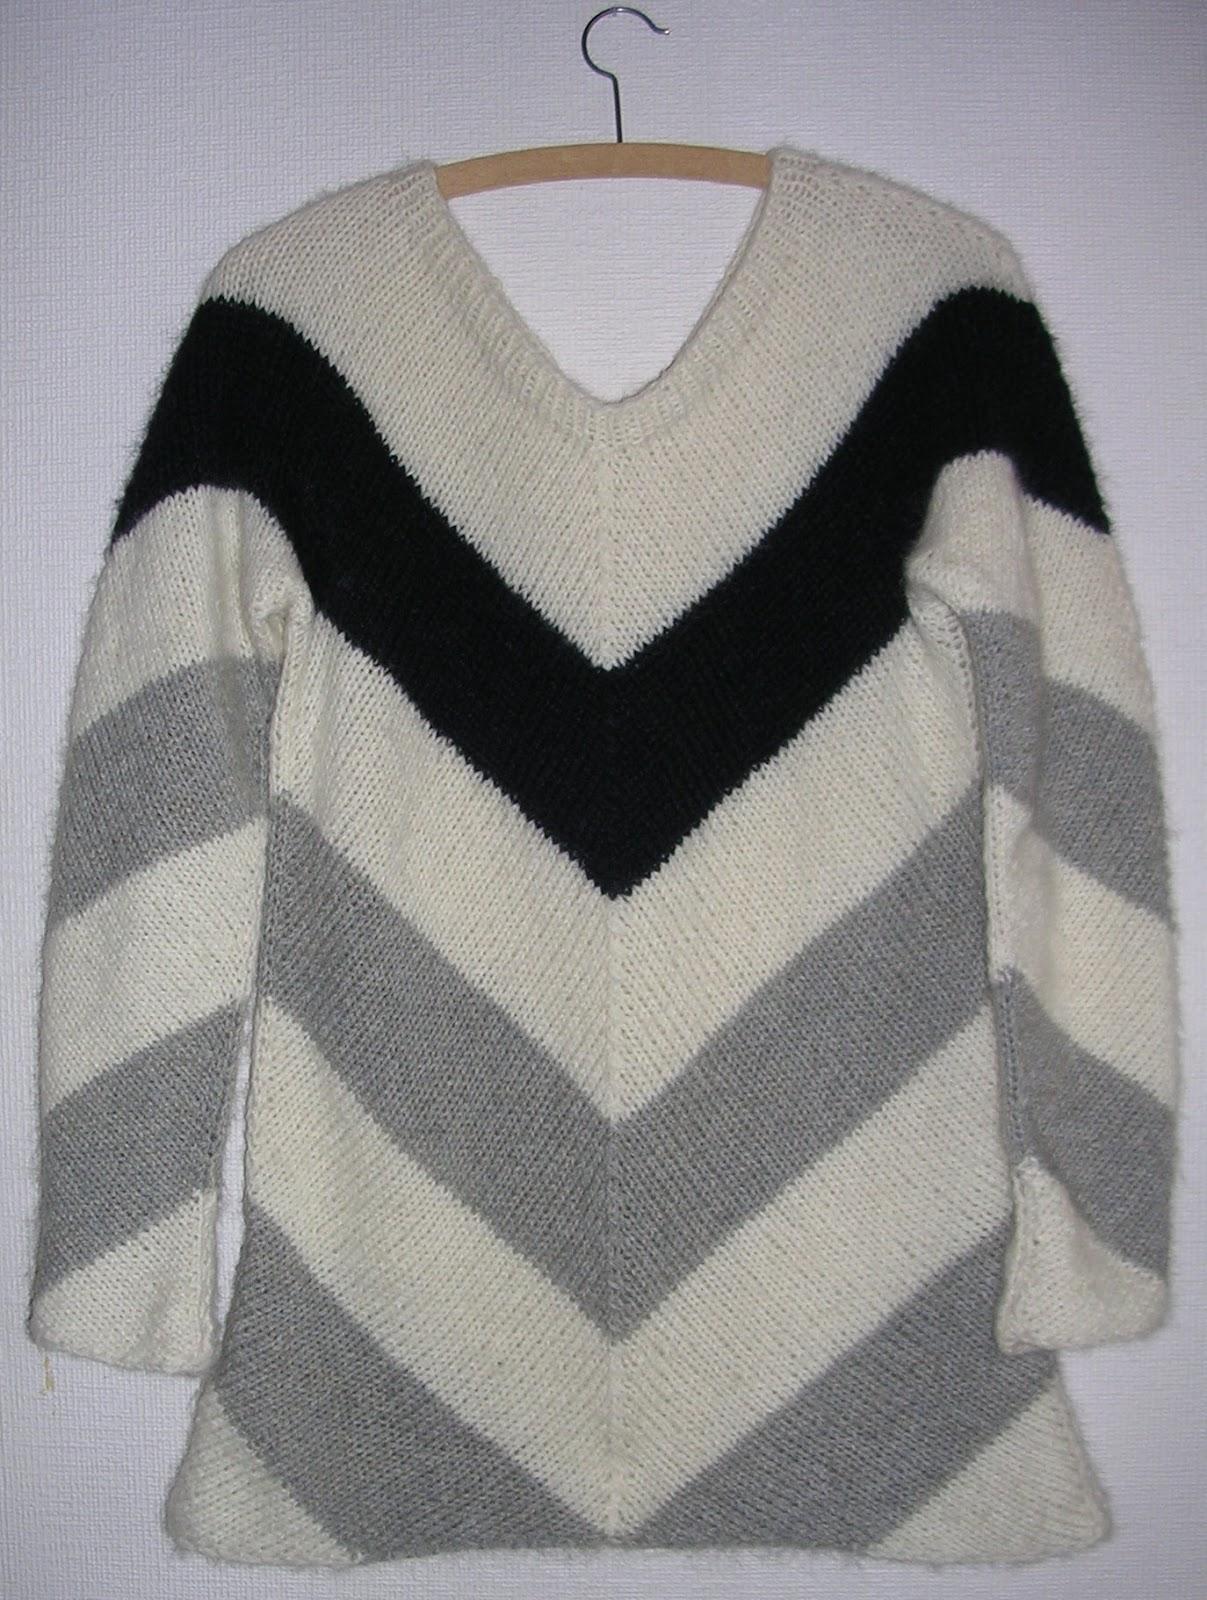 Knitting Pattern For The Killing Jumper : oddvor: Princess for one day